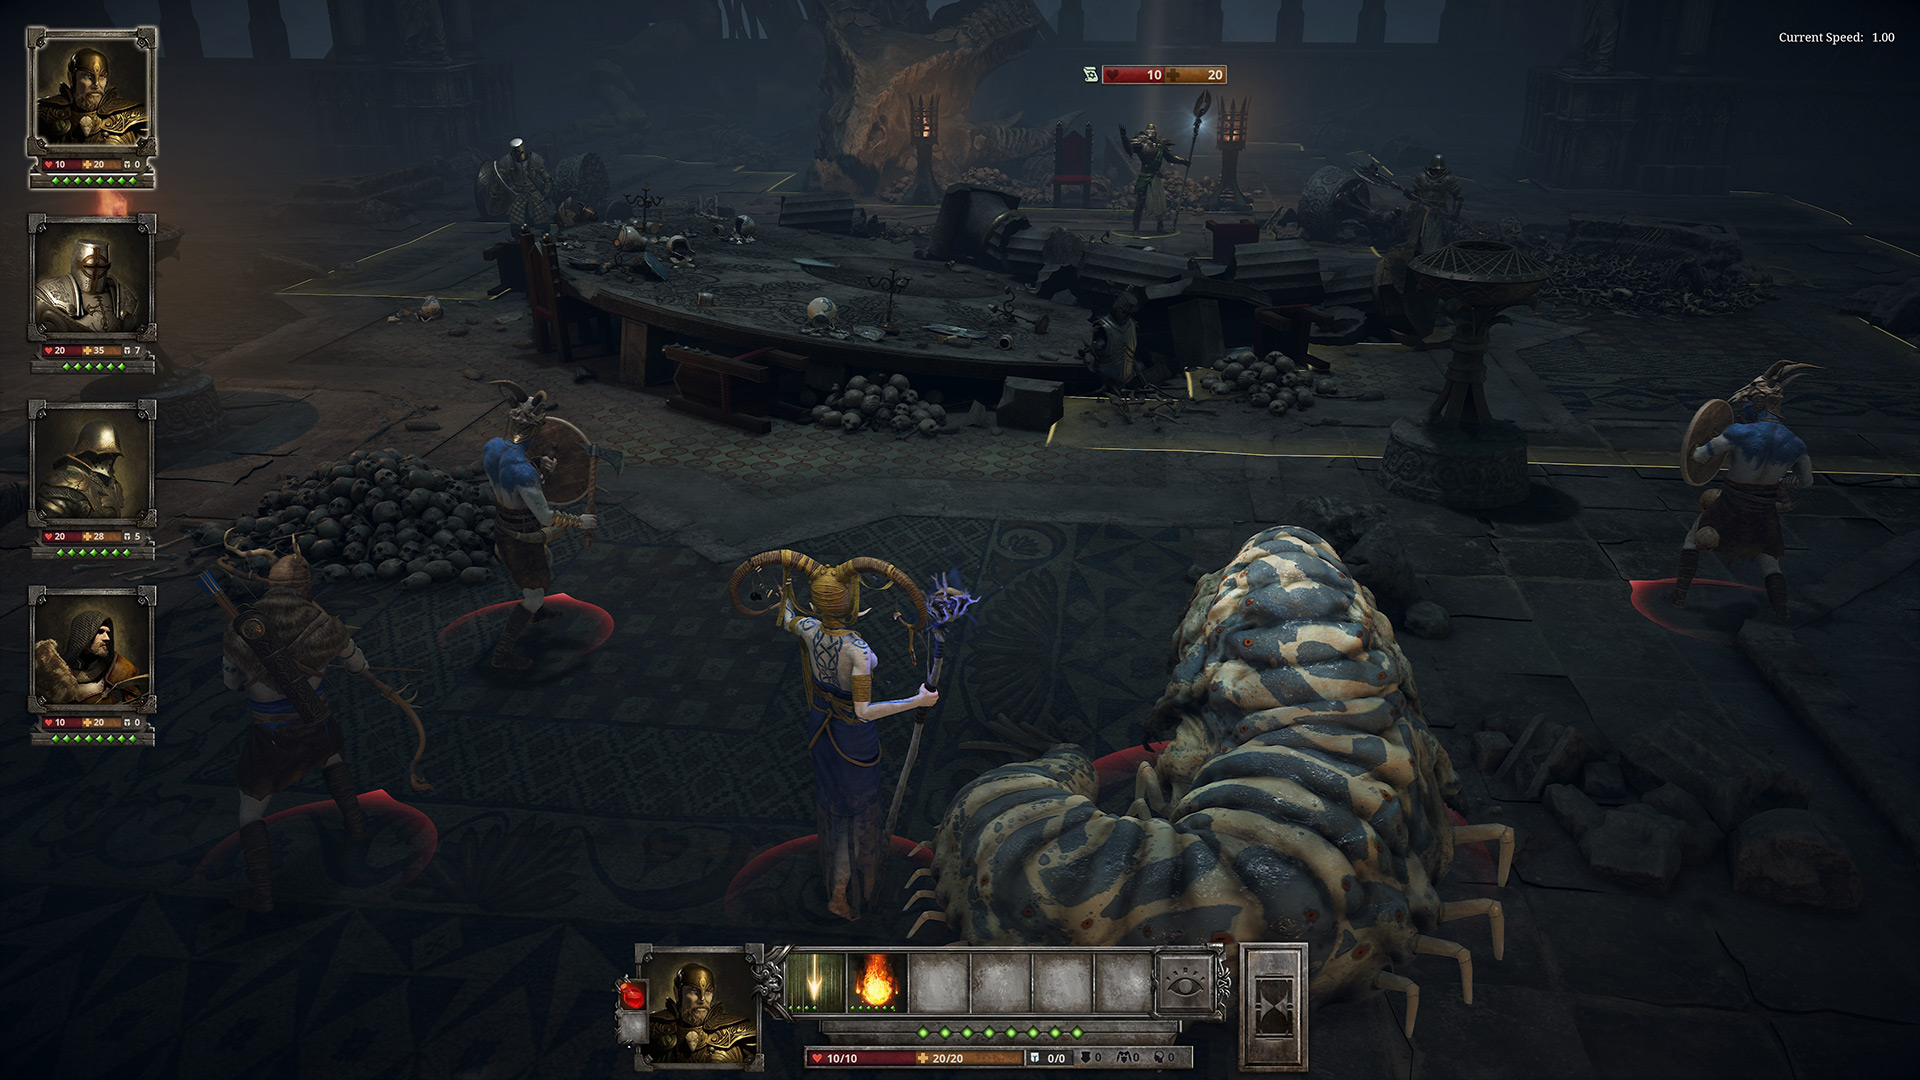 Студия Neocore анонсировала тактическую RPG King Arthur: Knight's Tale — запущена кампания на Kickstarter